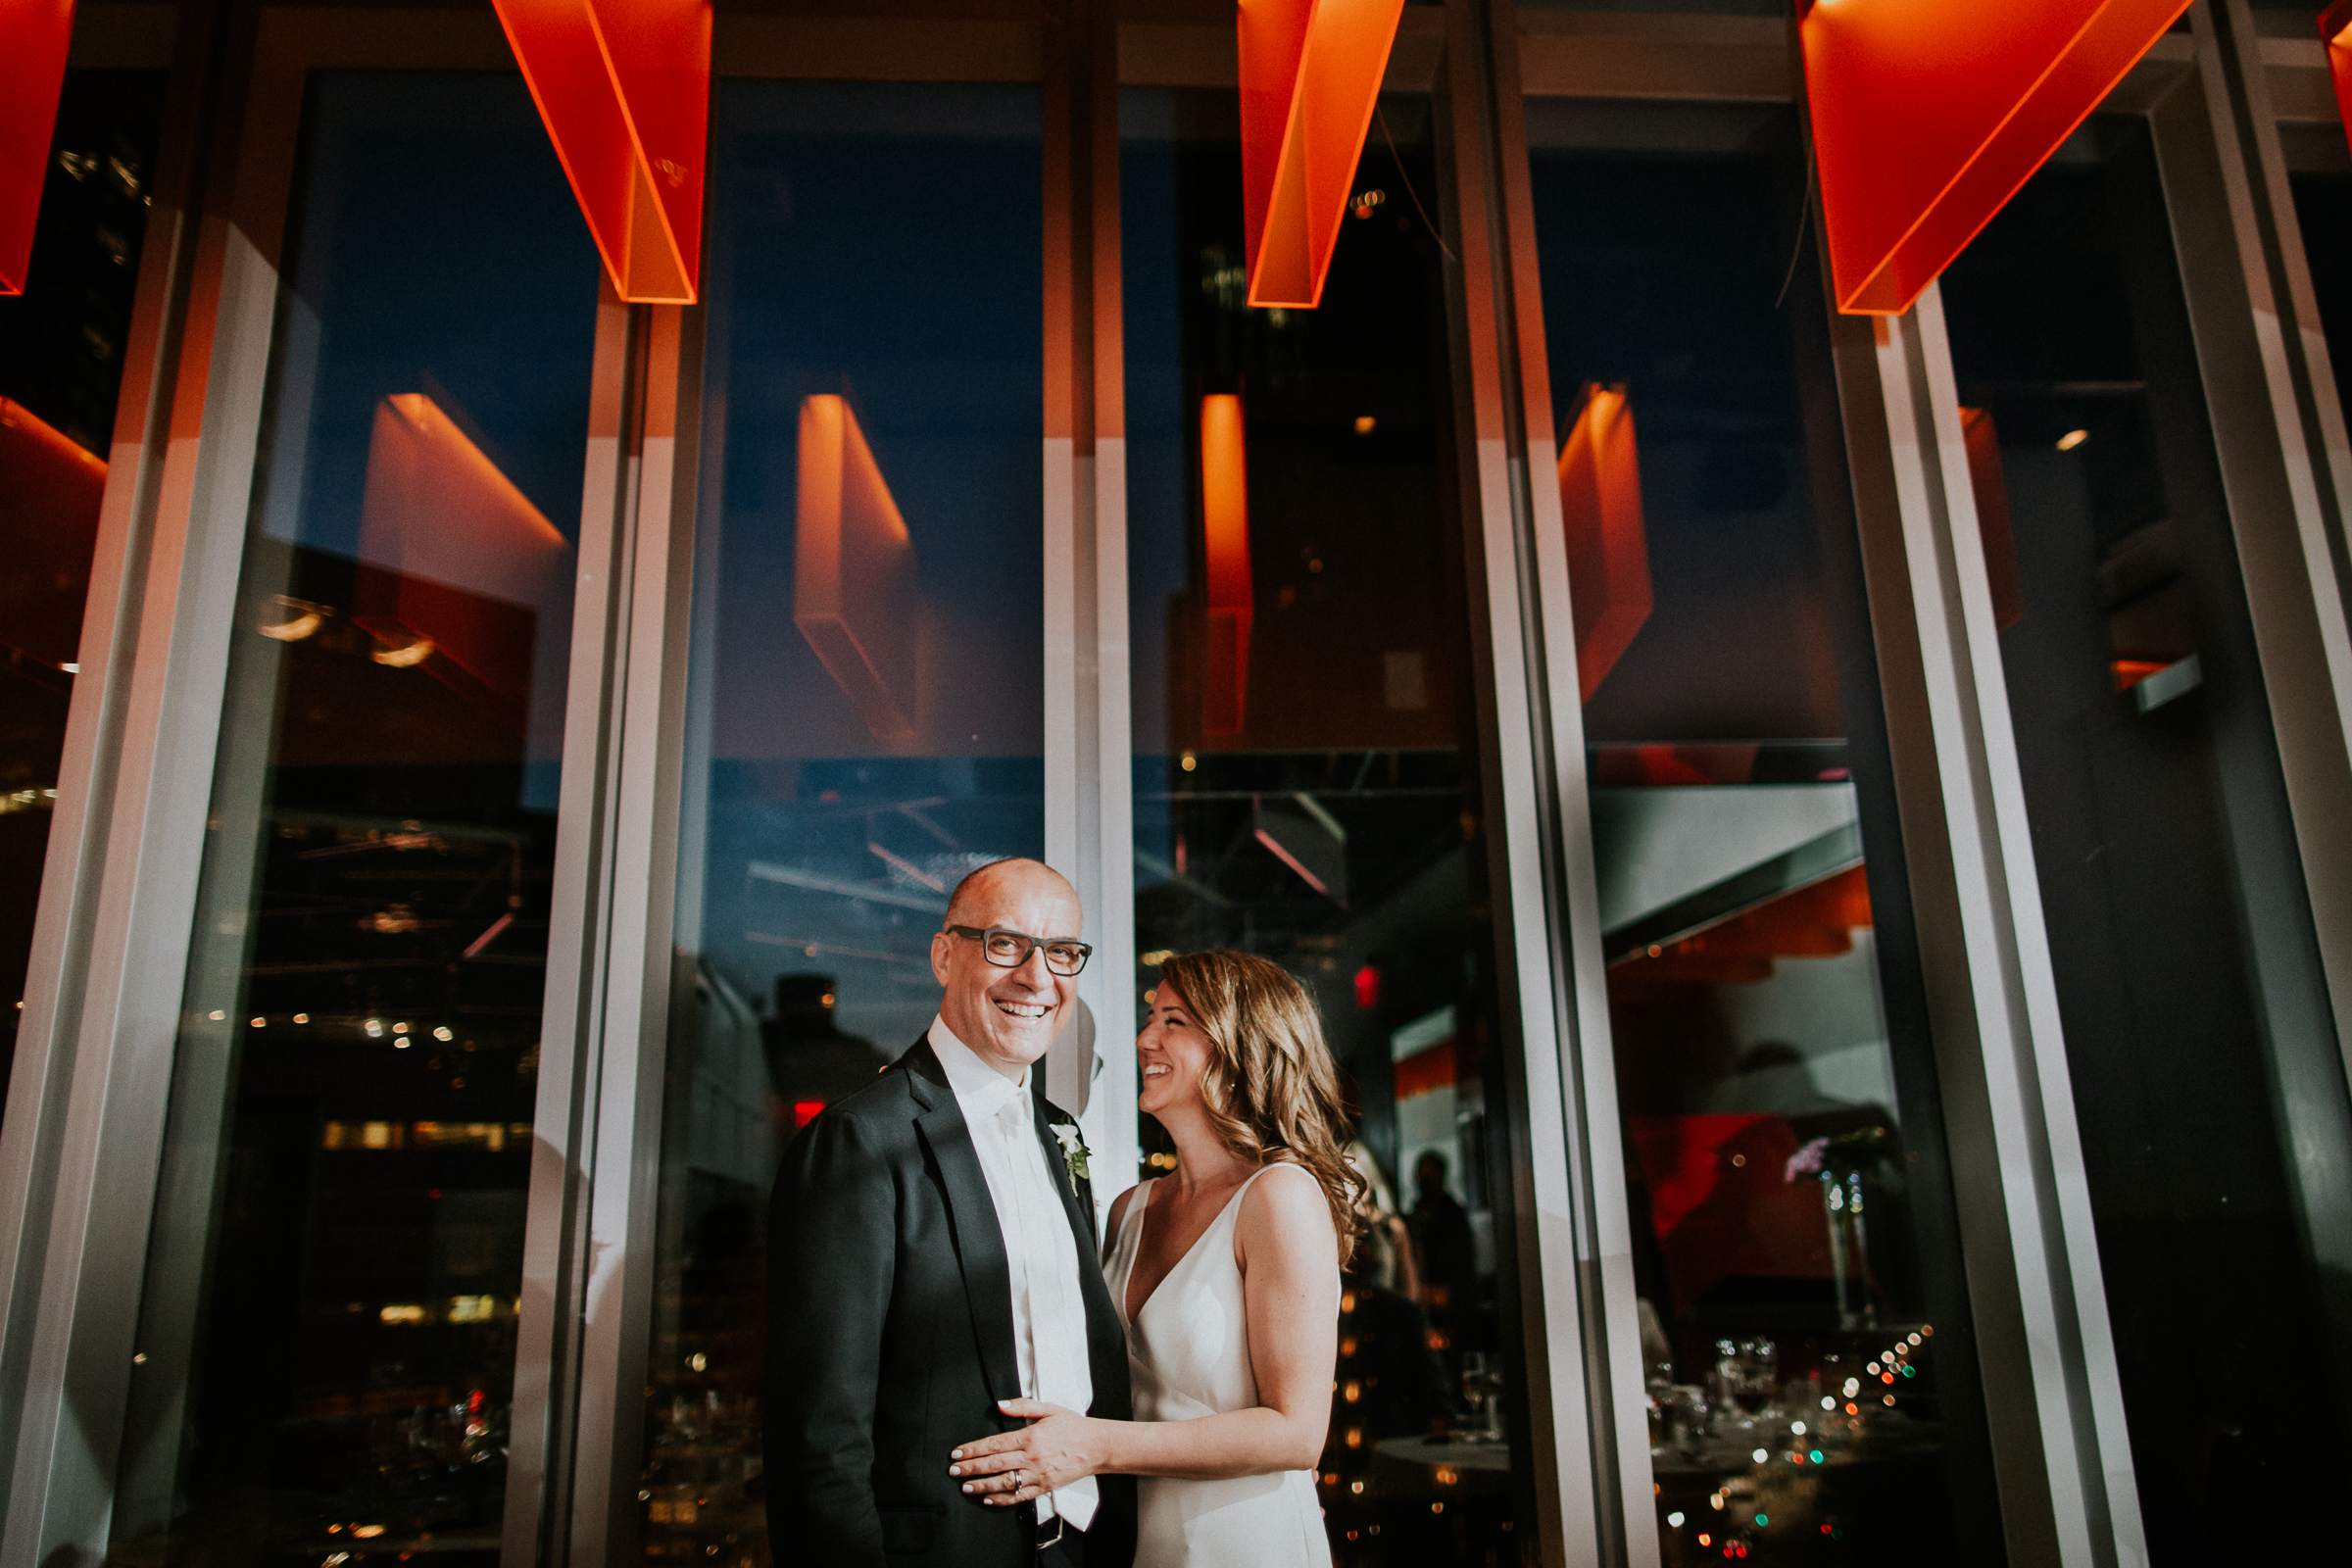 New-York-Documentary-Wedding-Photography-Best-Of-2017-by-Elvira-Kalviste-Photography-29.jpg